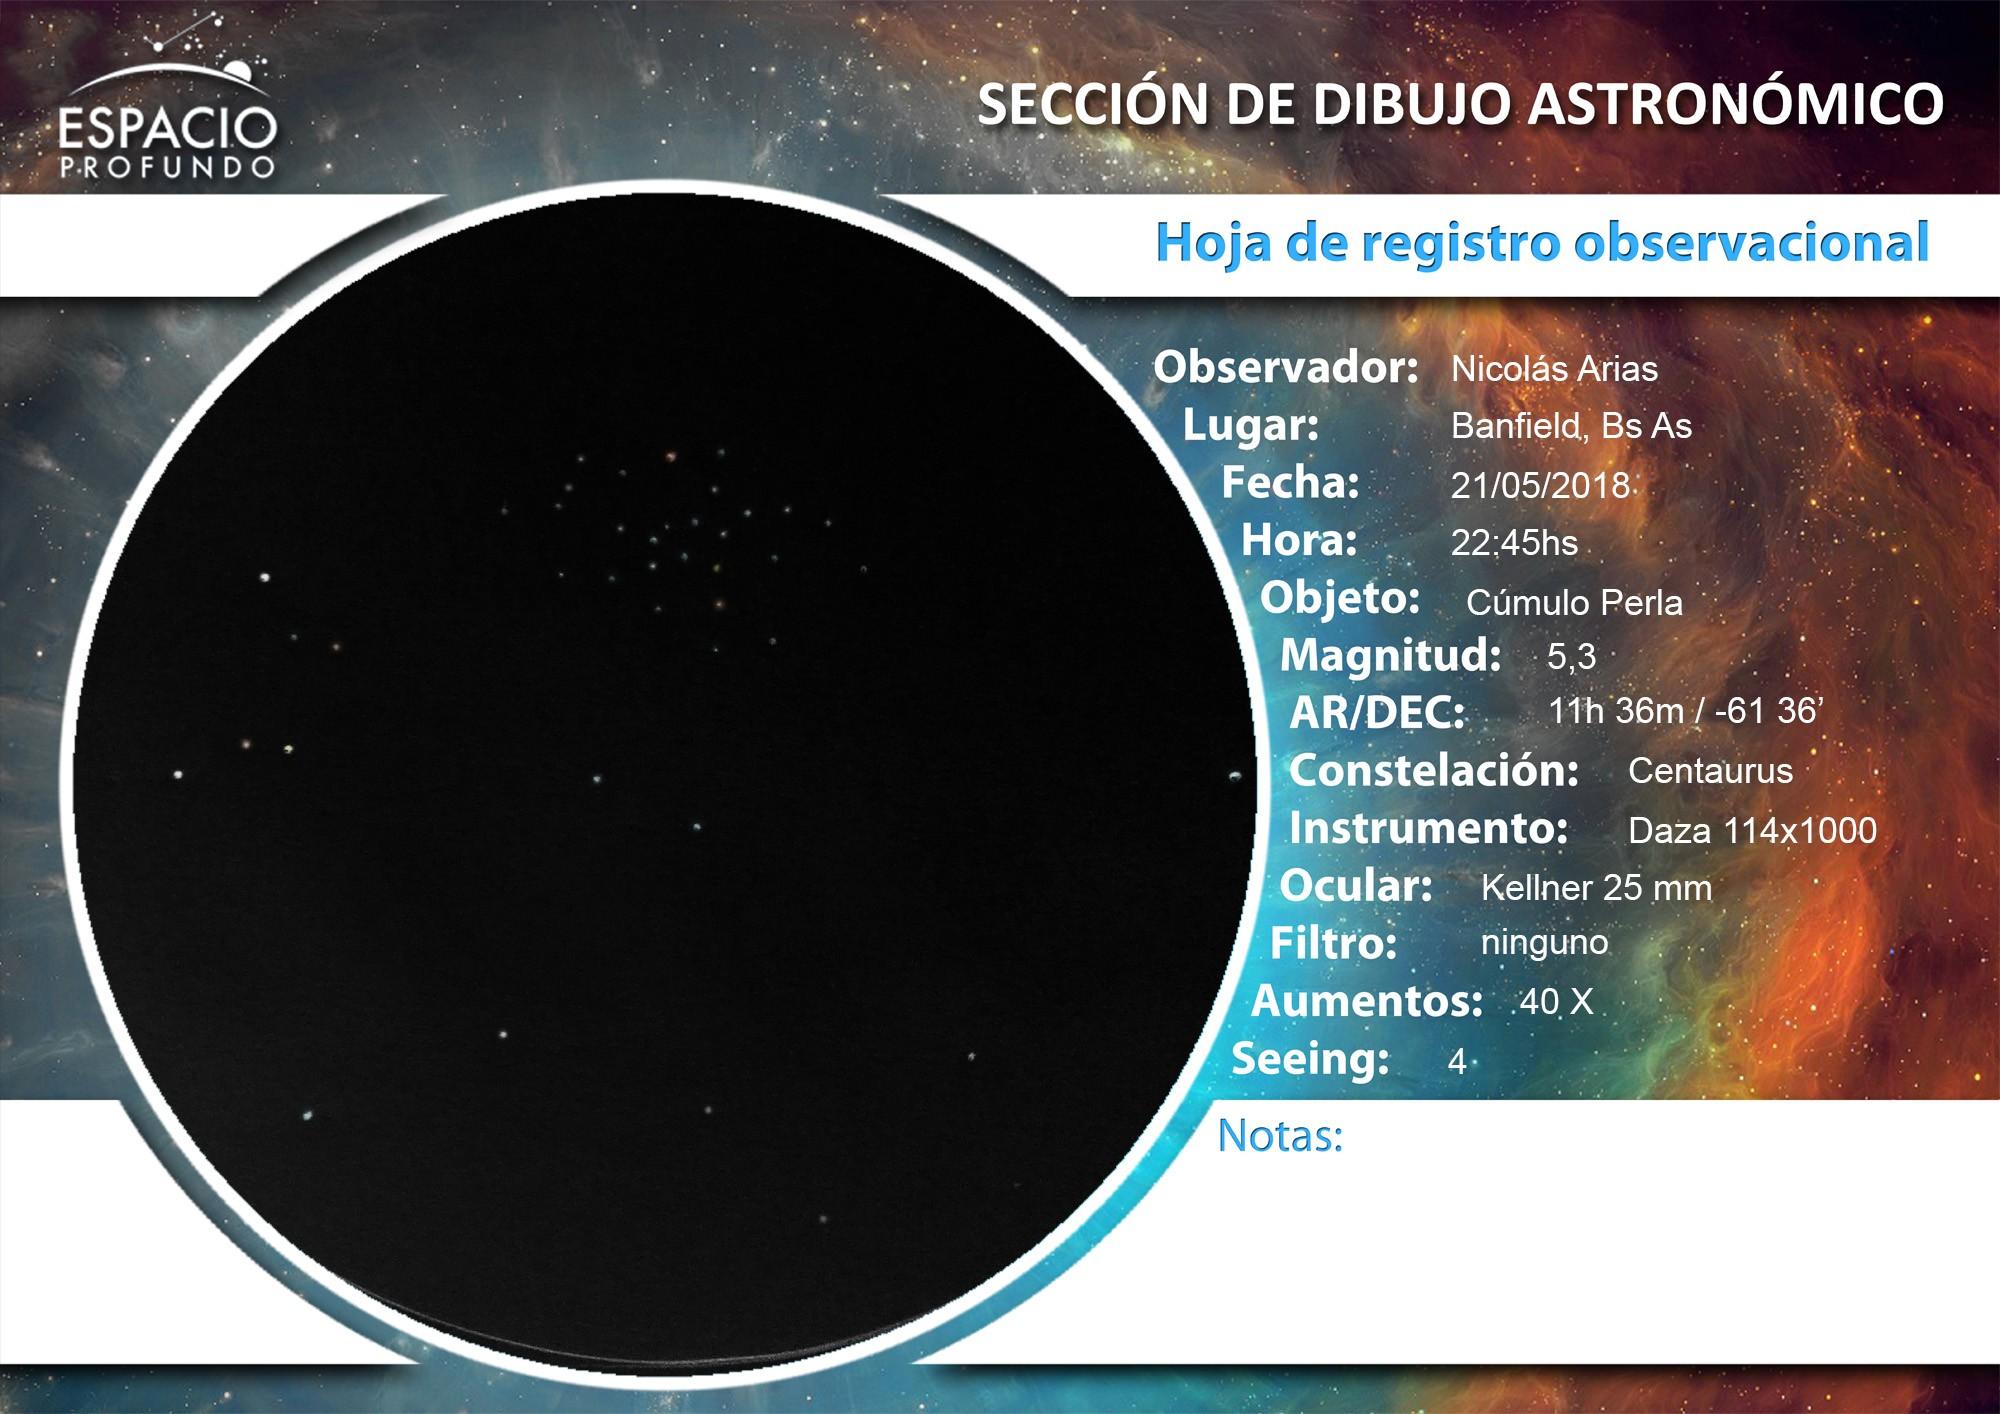 Registro_Observacional 21-5 Cúmulo Perla